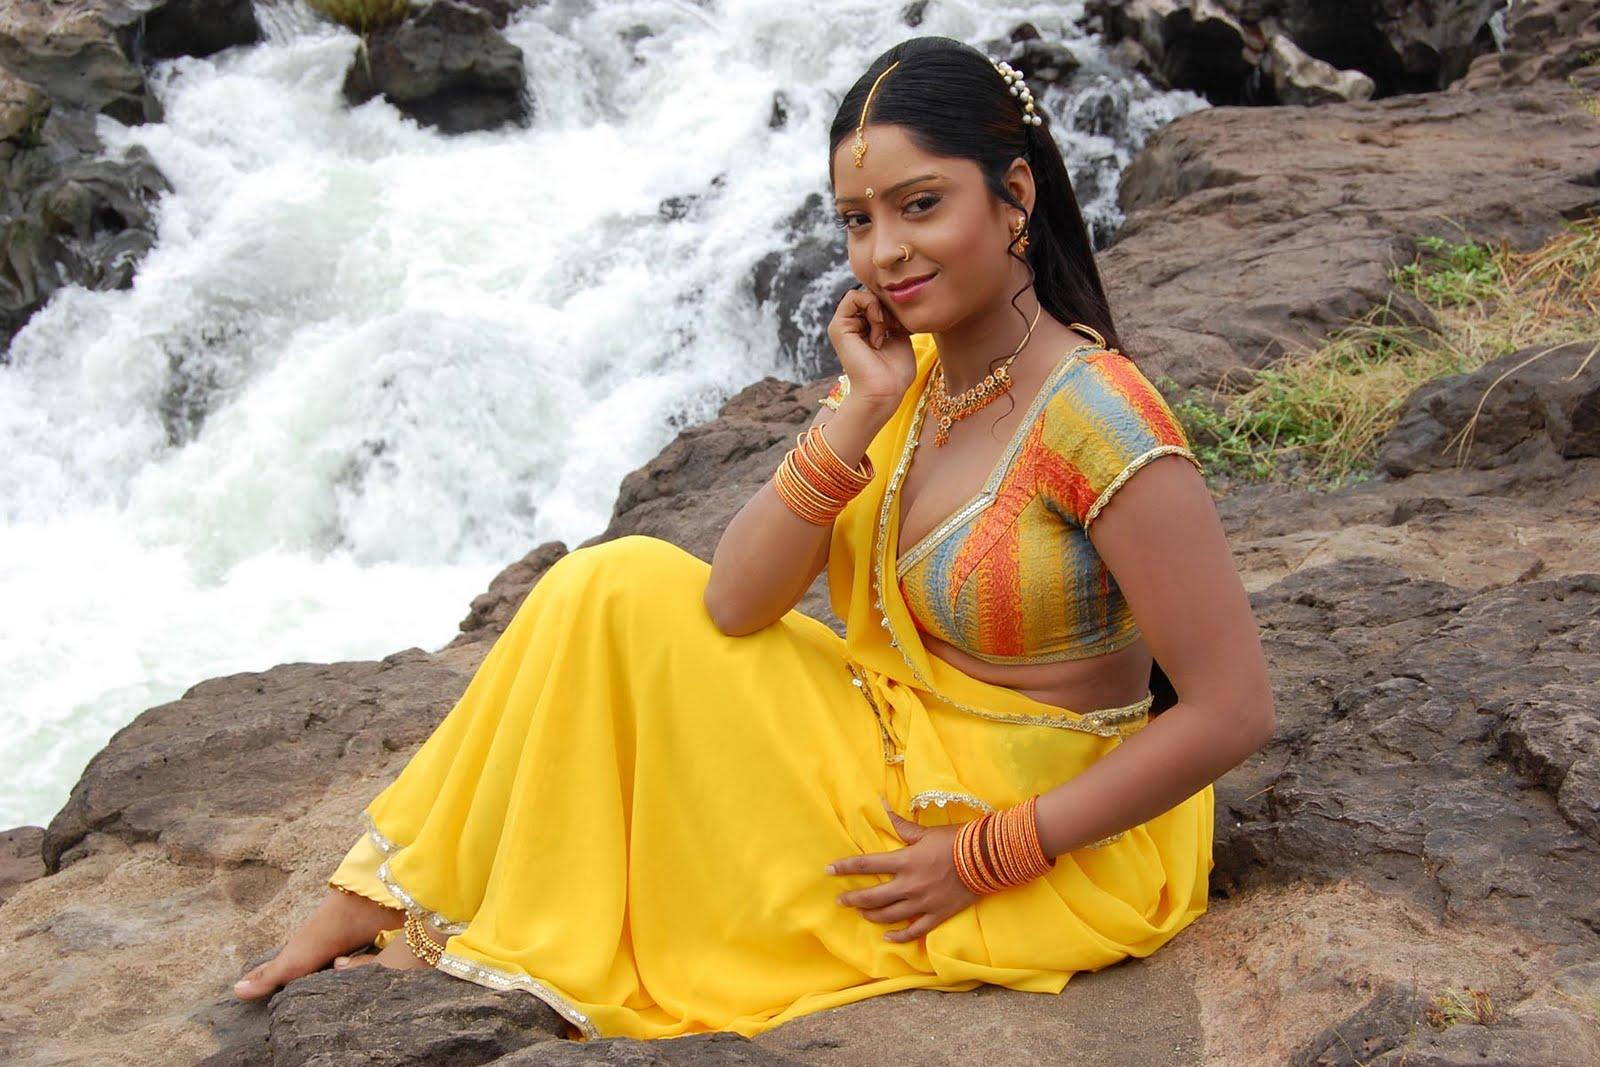 Bhojpuri Songs And Video Free Download Bhojpuri Hot Photo